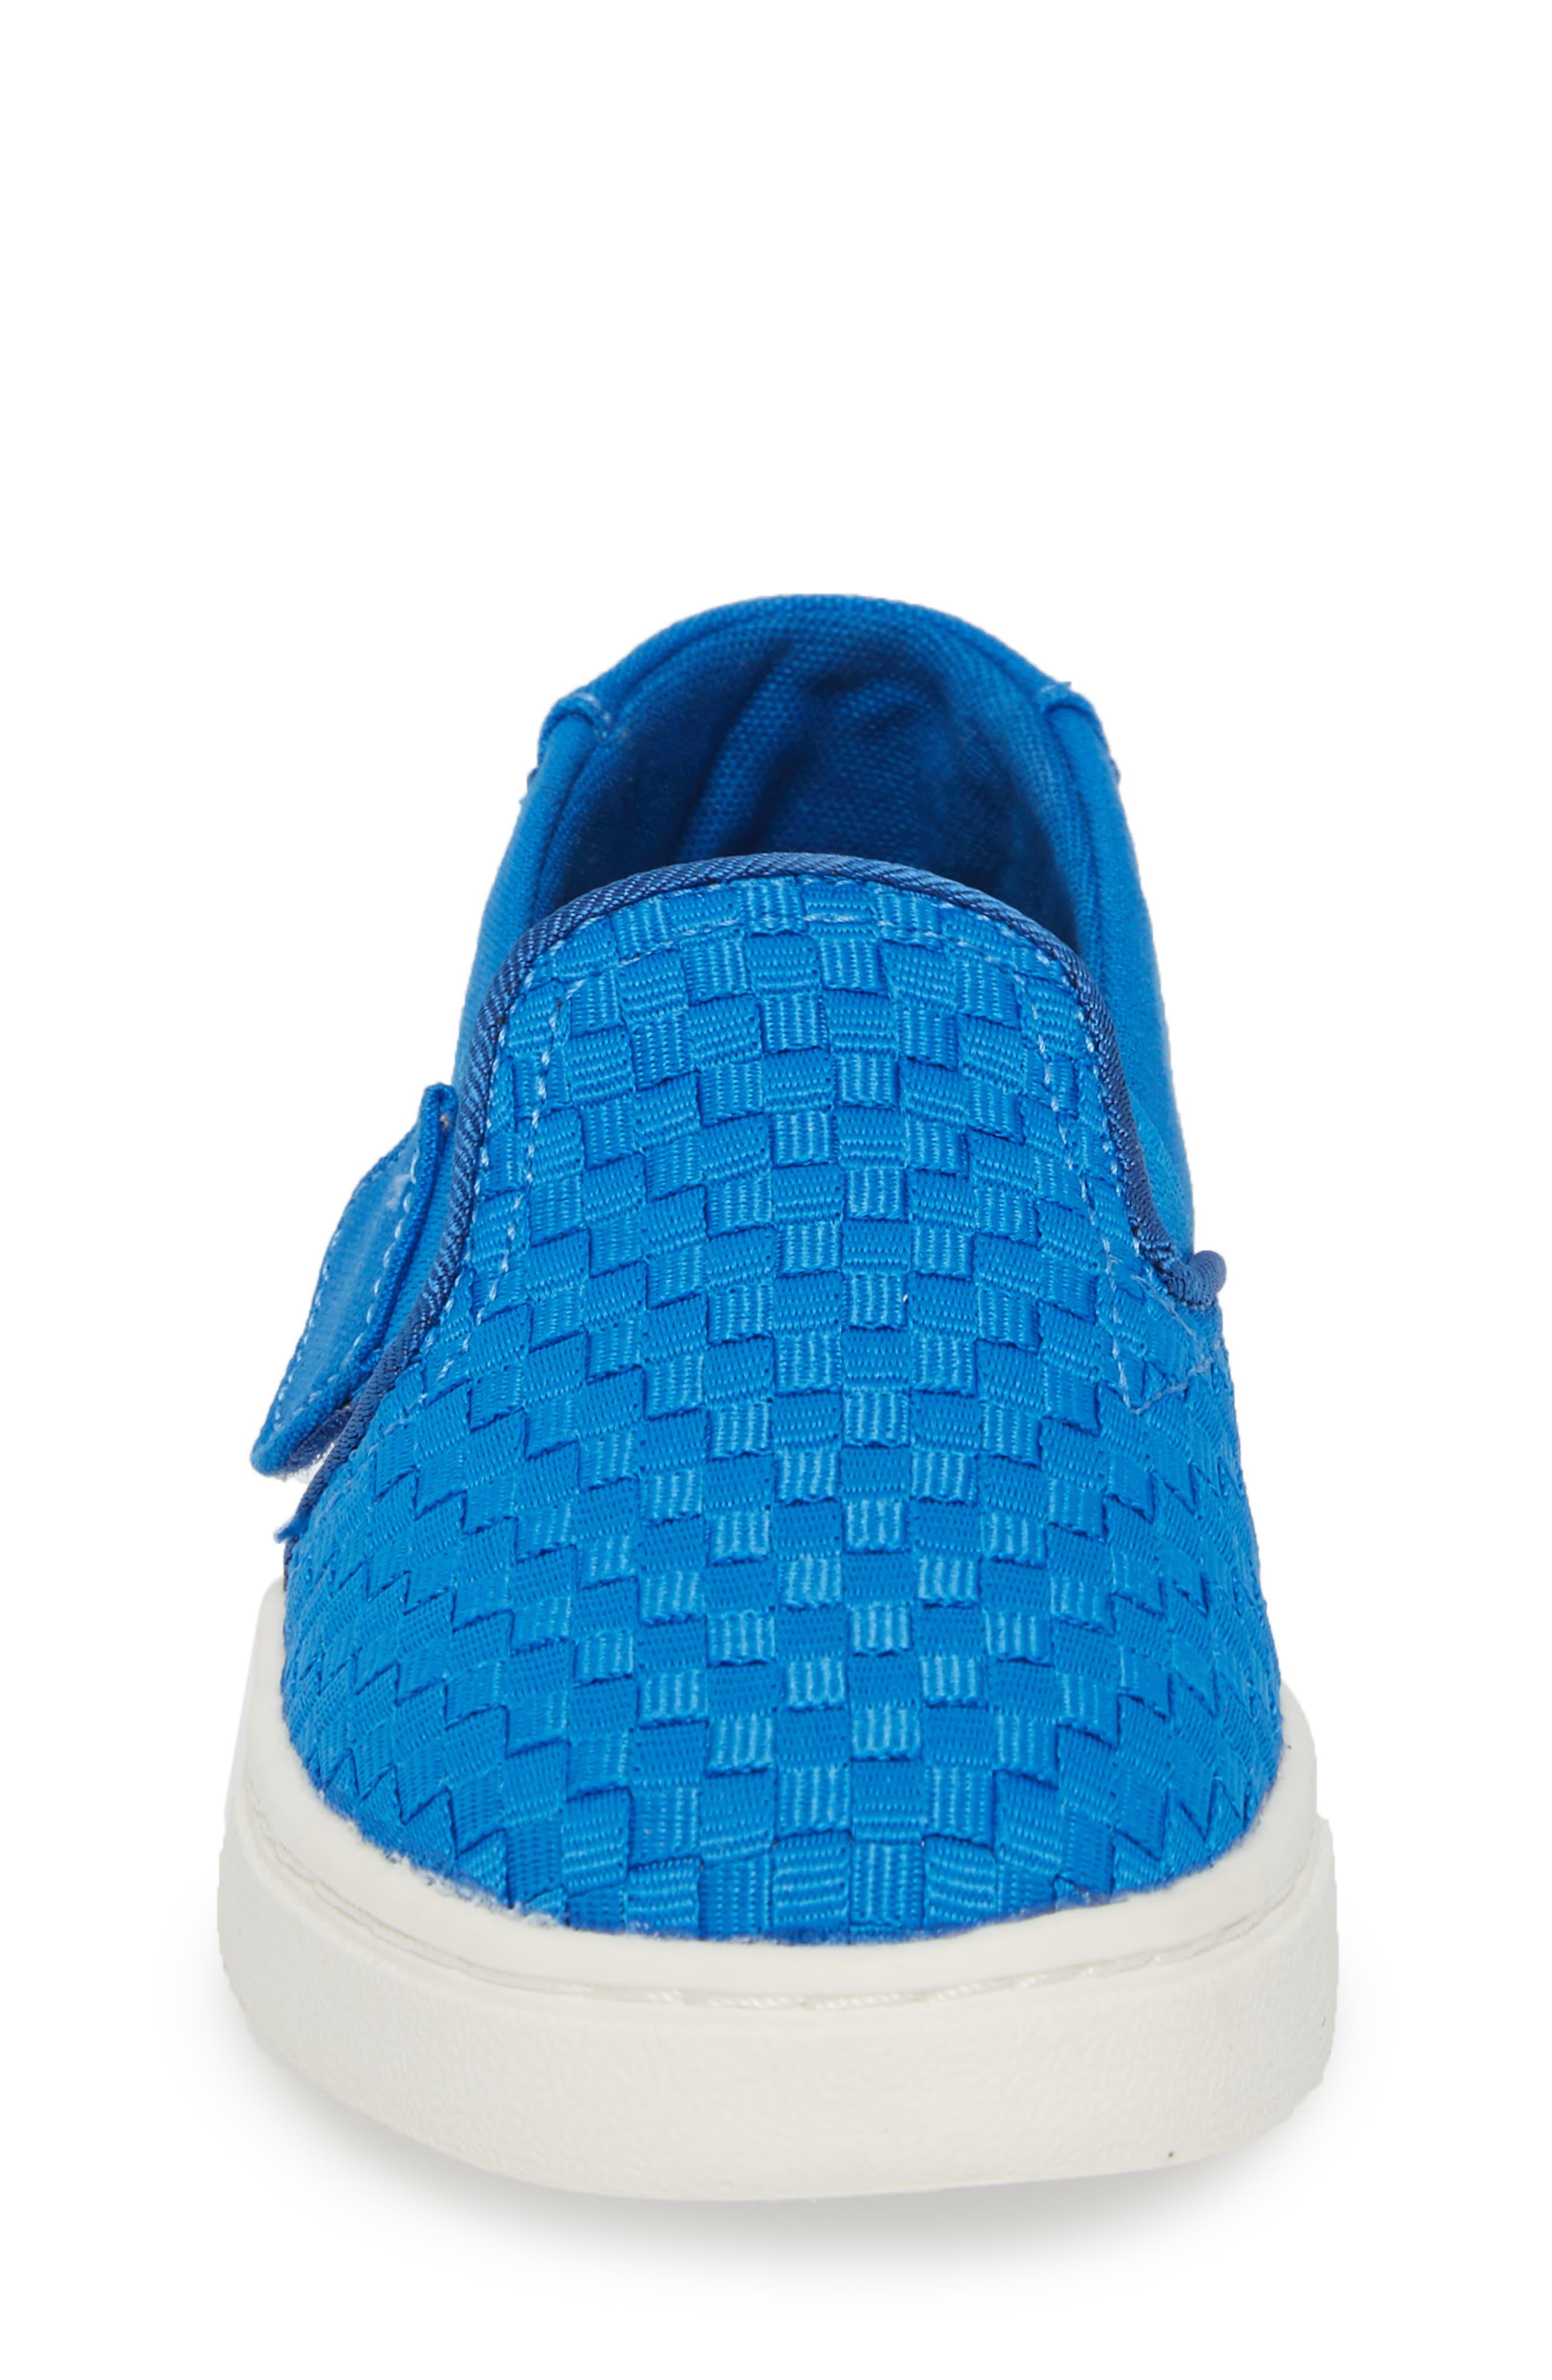 Luca Slip-On Sneaker,                             Alternate thumbnail 4, color,                             Imperial Blue Basketweave